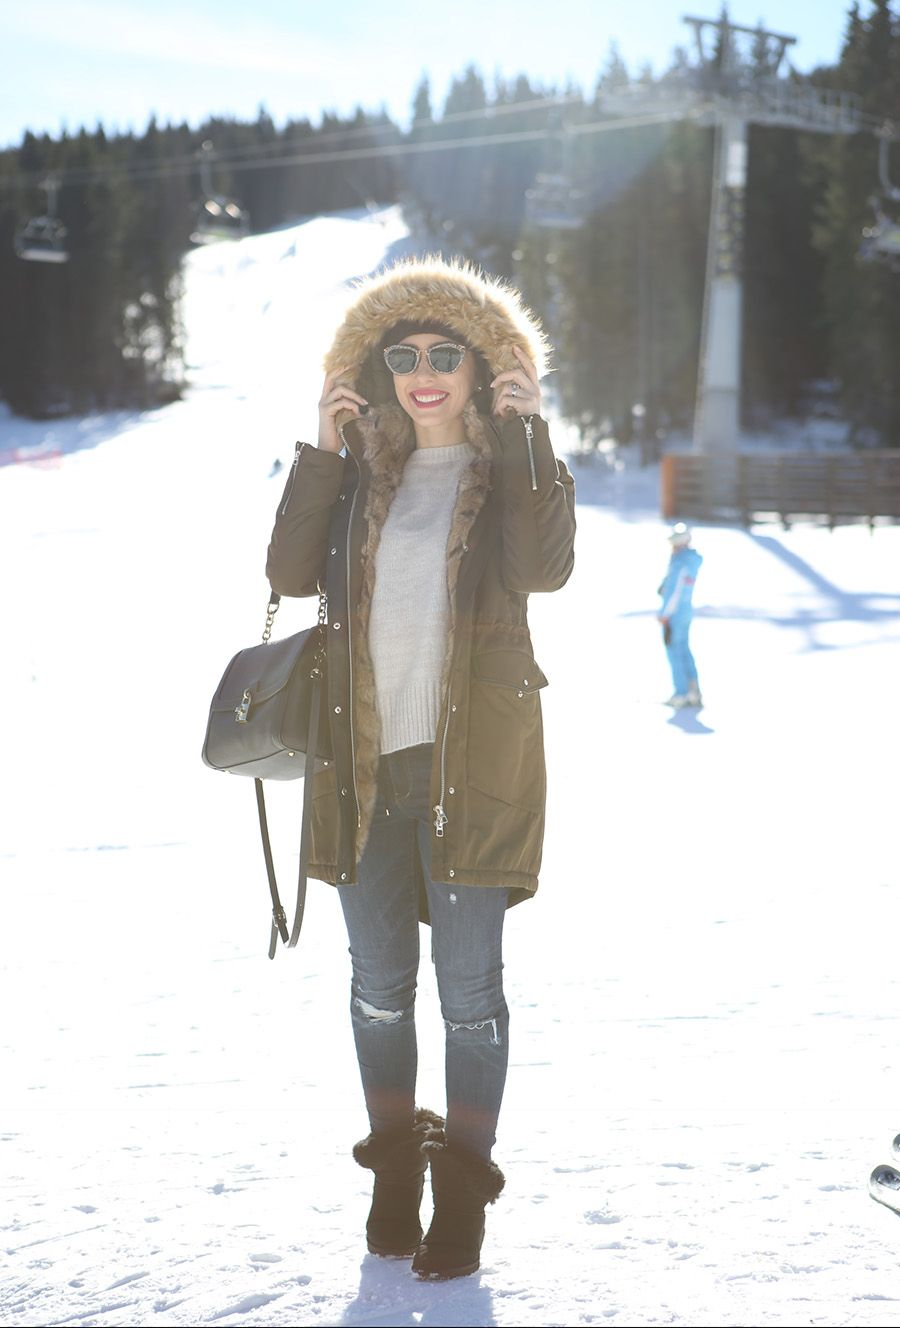 Kopaonik Mountain Outfit / Stasha Fashion Outfit by Anastasija Djuric